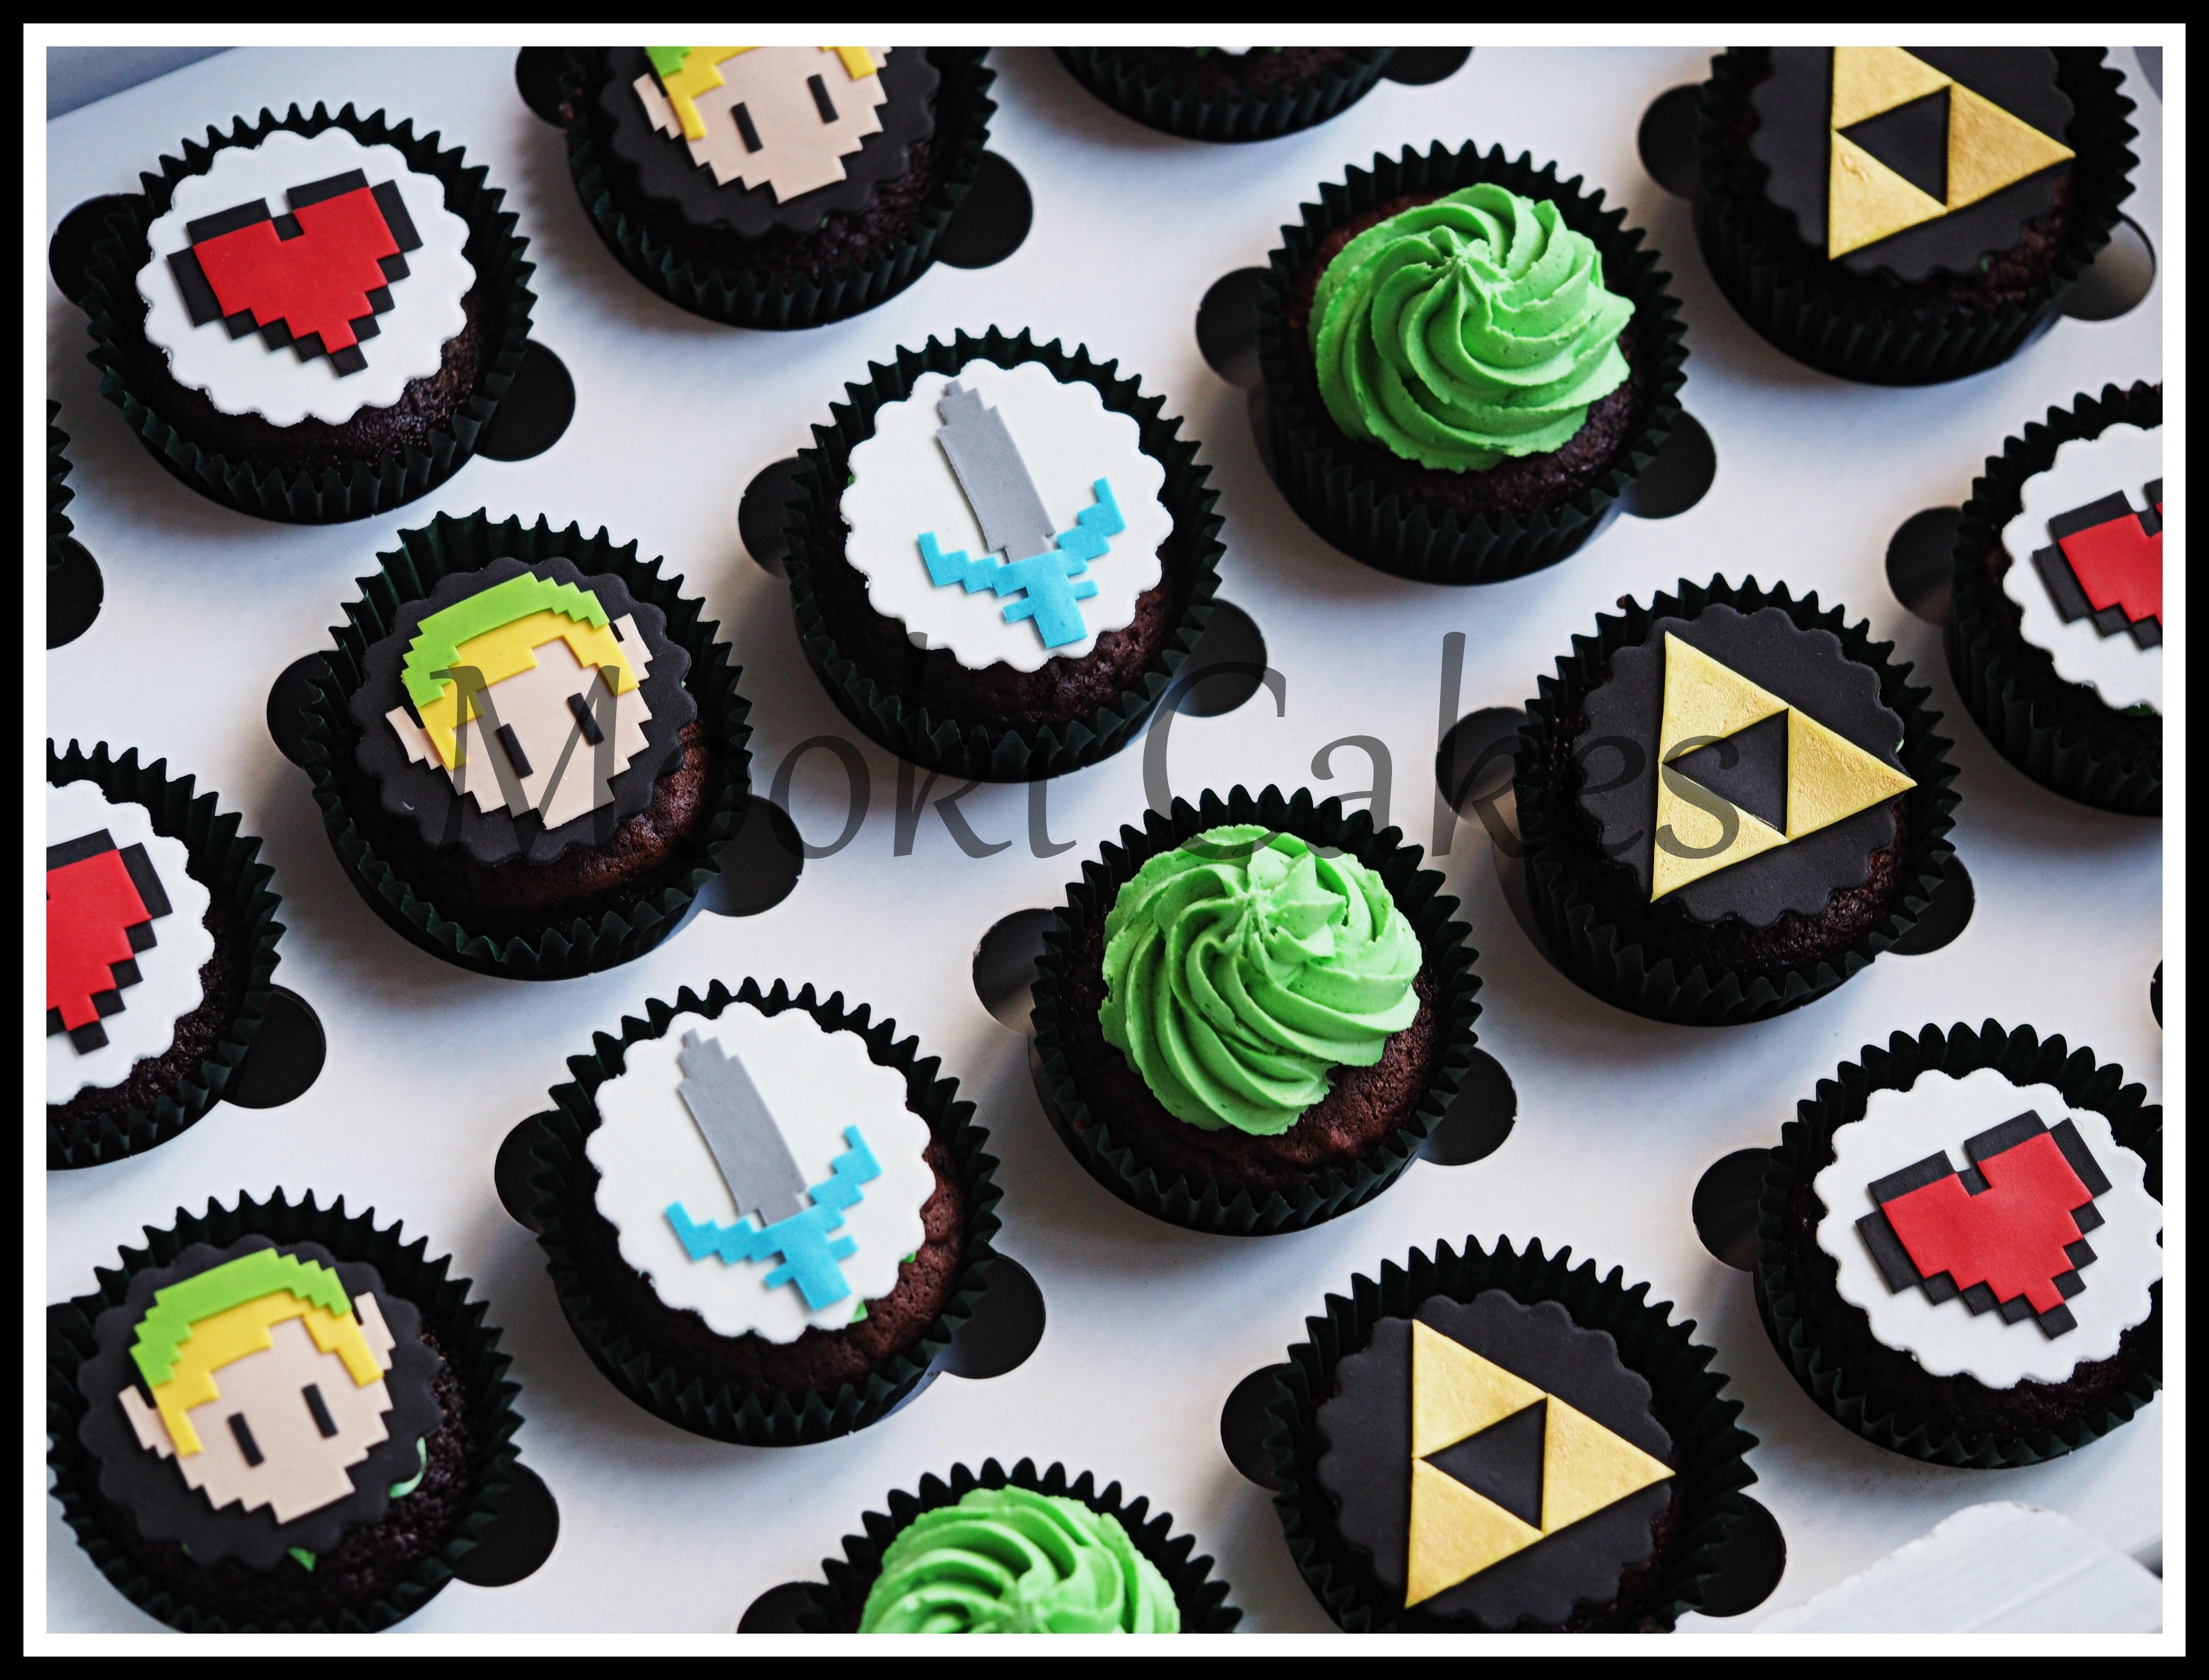 Zelda Cupcakes Cakes Cakes And Cakes Pinterest Birthdays